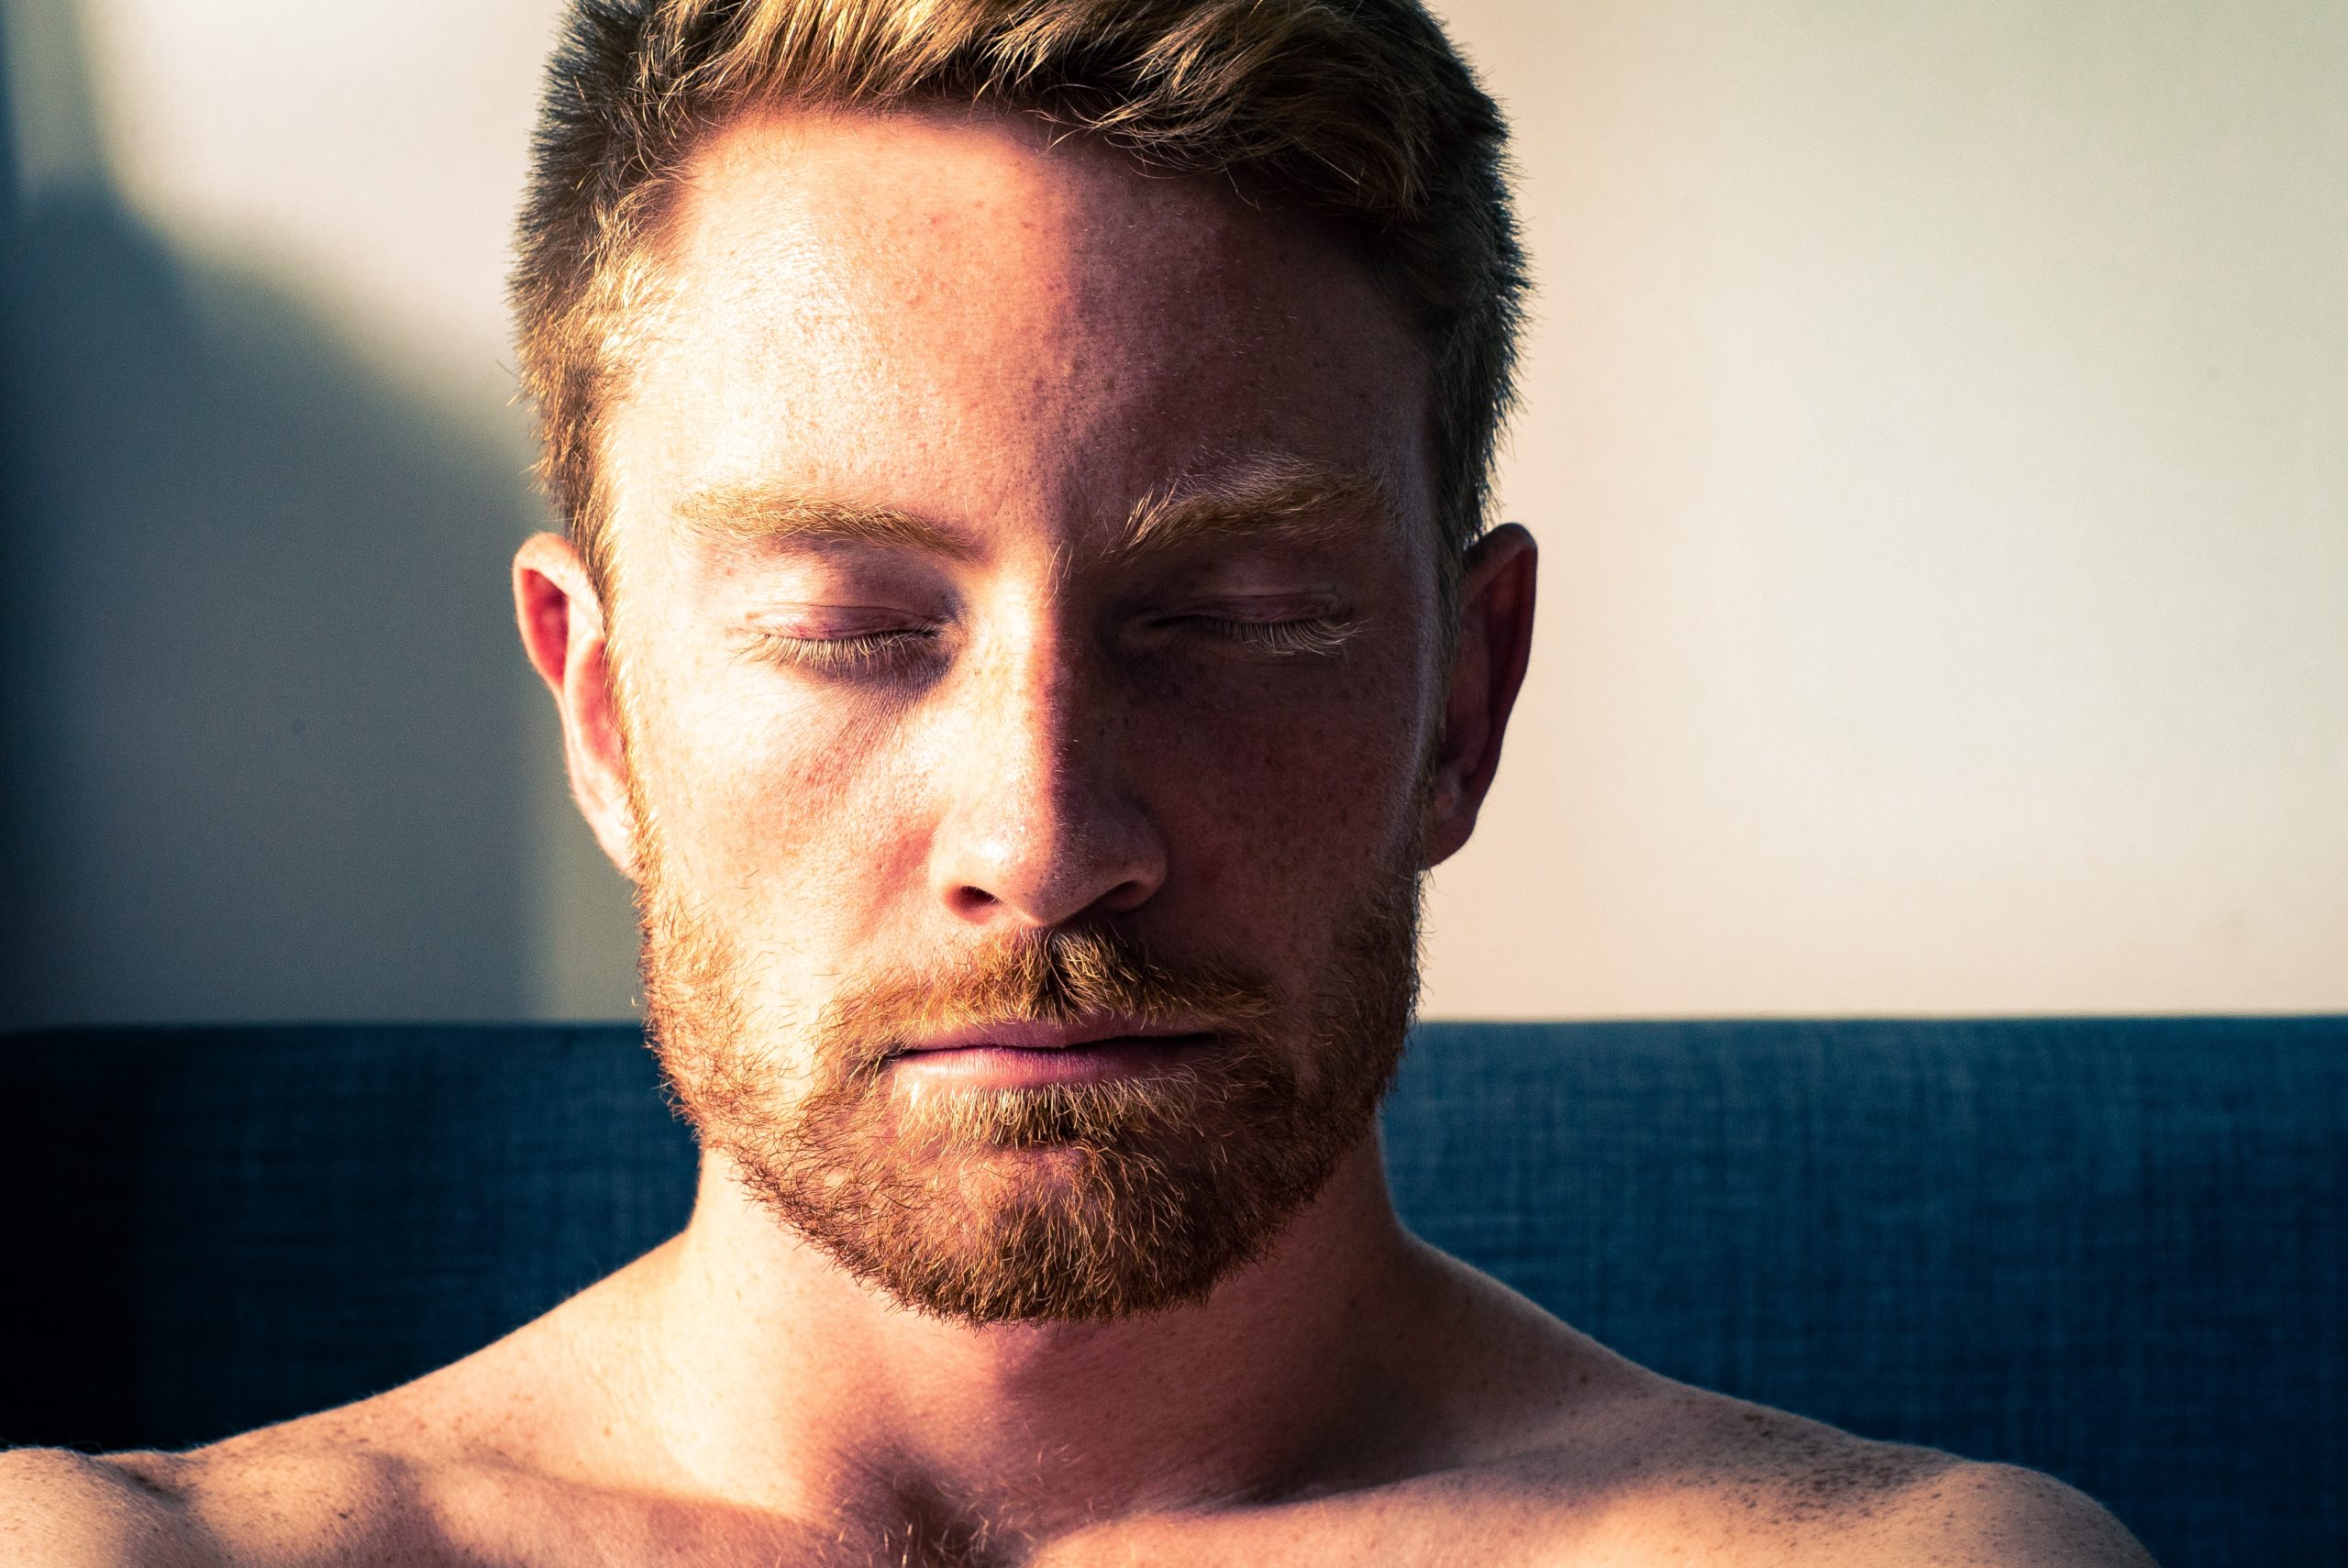 Mindfulness Meditation As Powerful As Medication